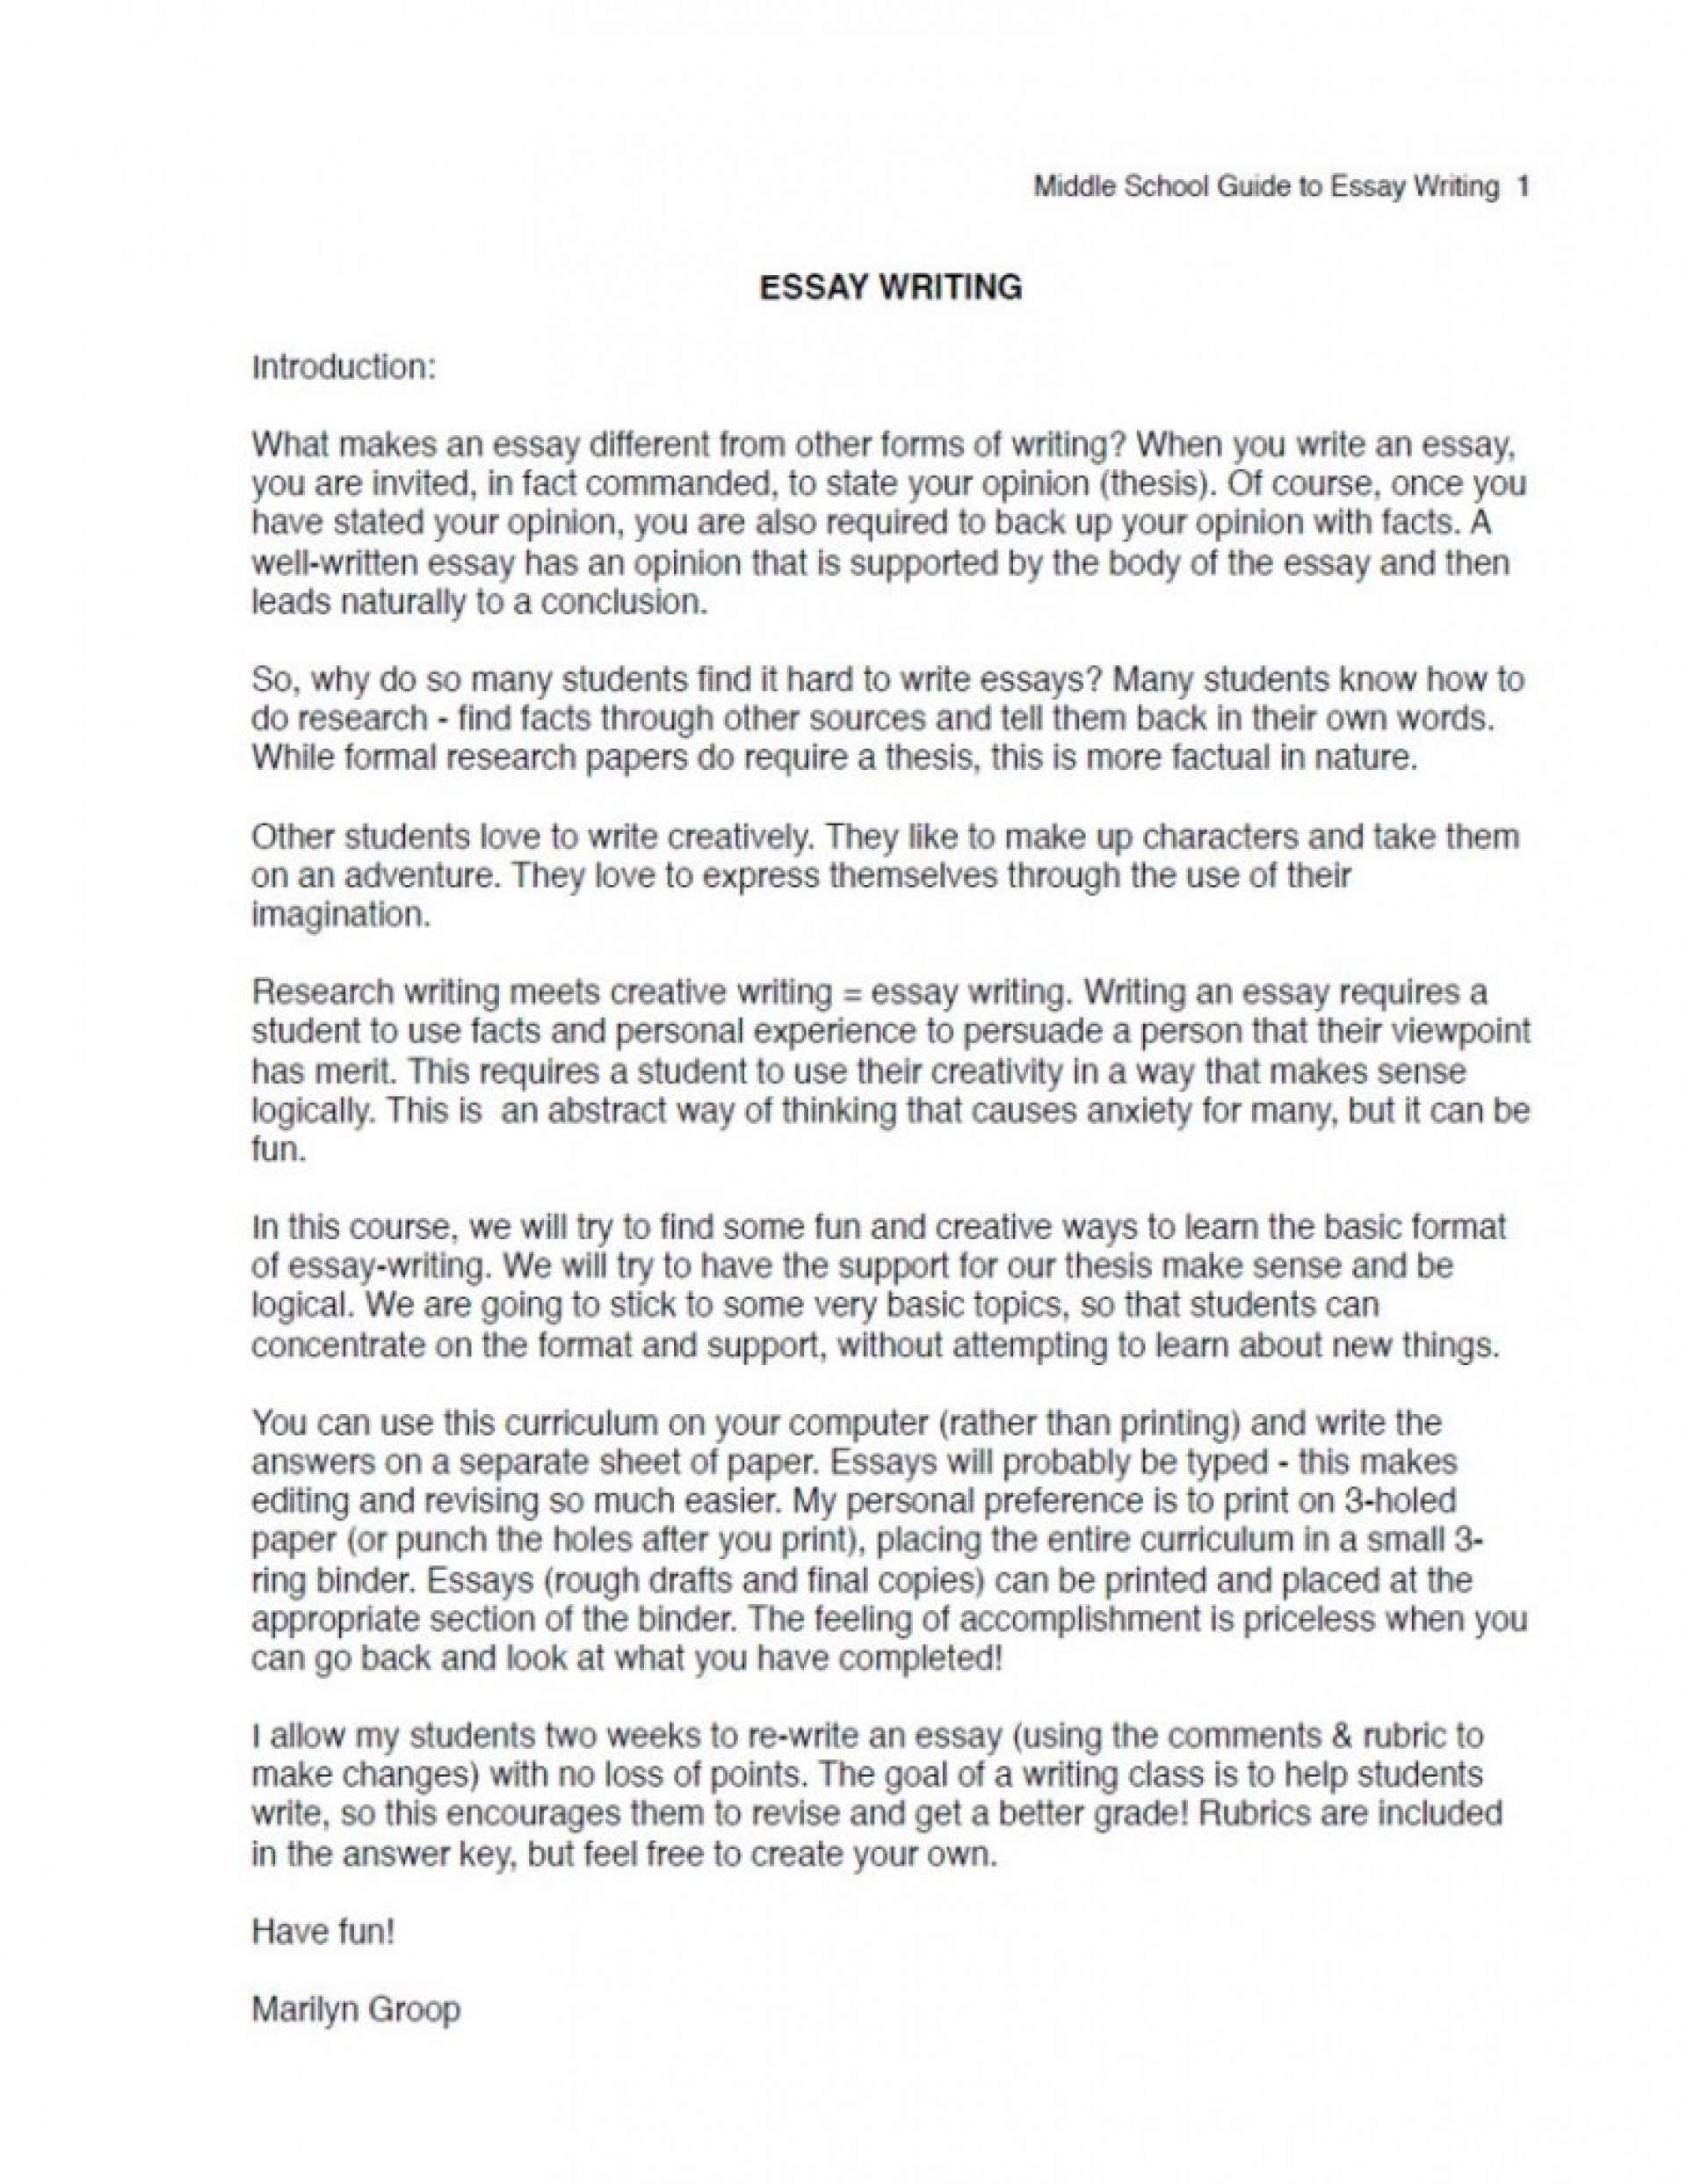 011 Interesting Persuasive Essay Topics Ms Excerpt 791x1024cb Unforgettable Argumentative For High School Students Funny Speech 1920